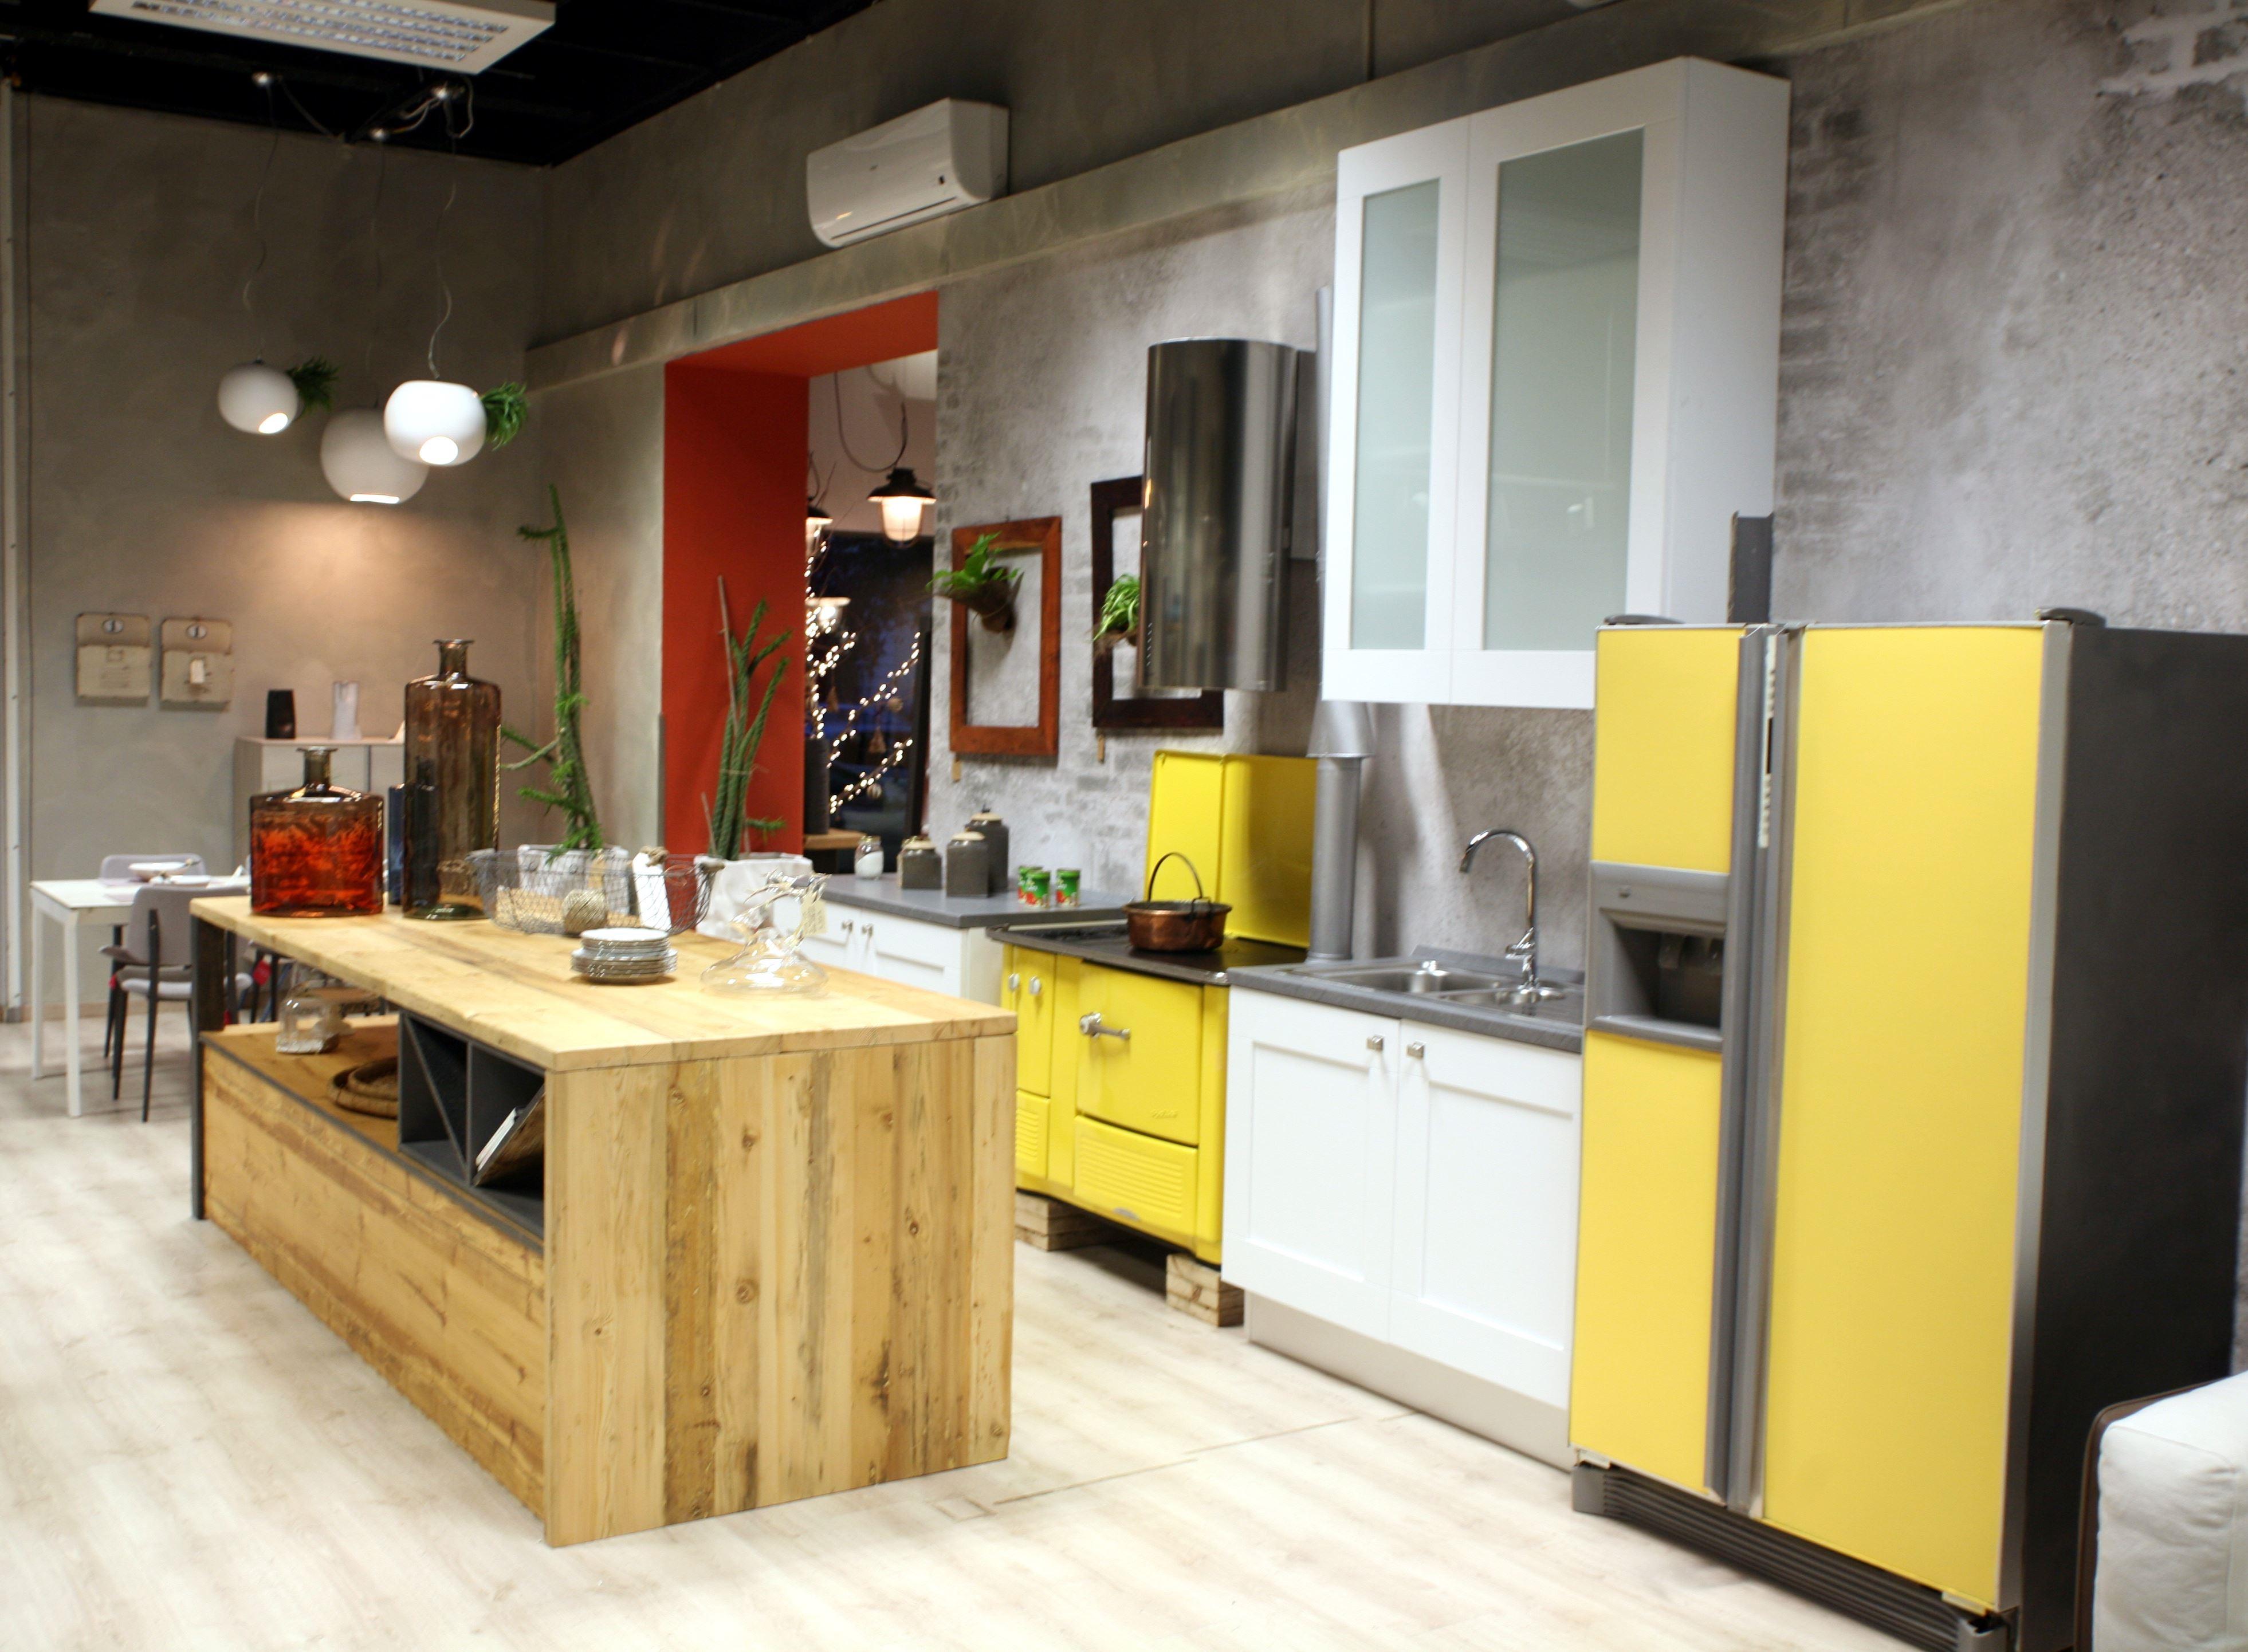 Tavoli Da Cucina In Legno: Cucina su misura in noce. noce nazionale e ...